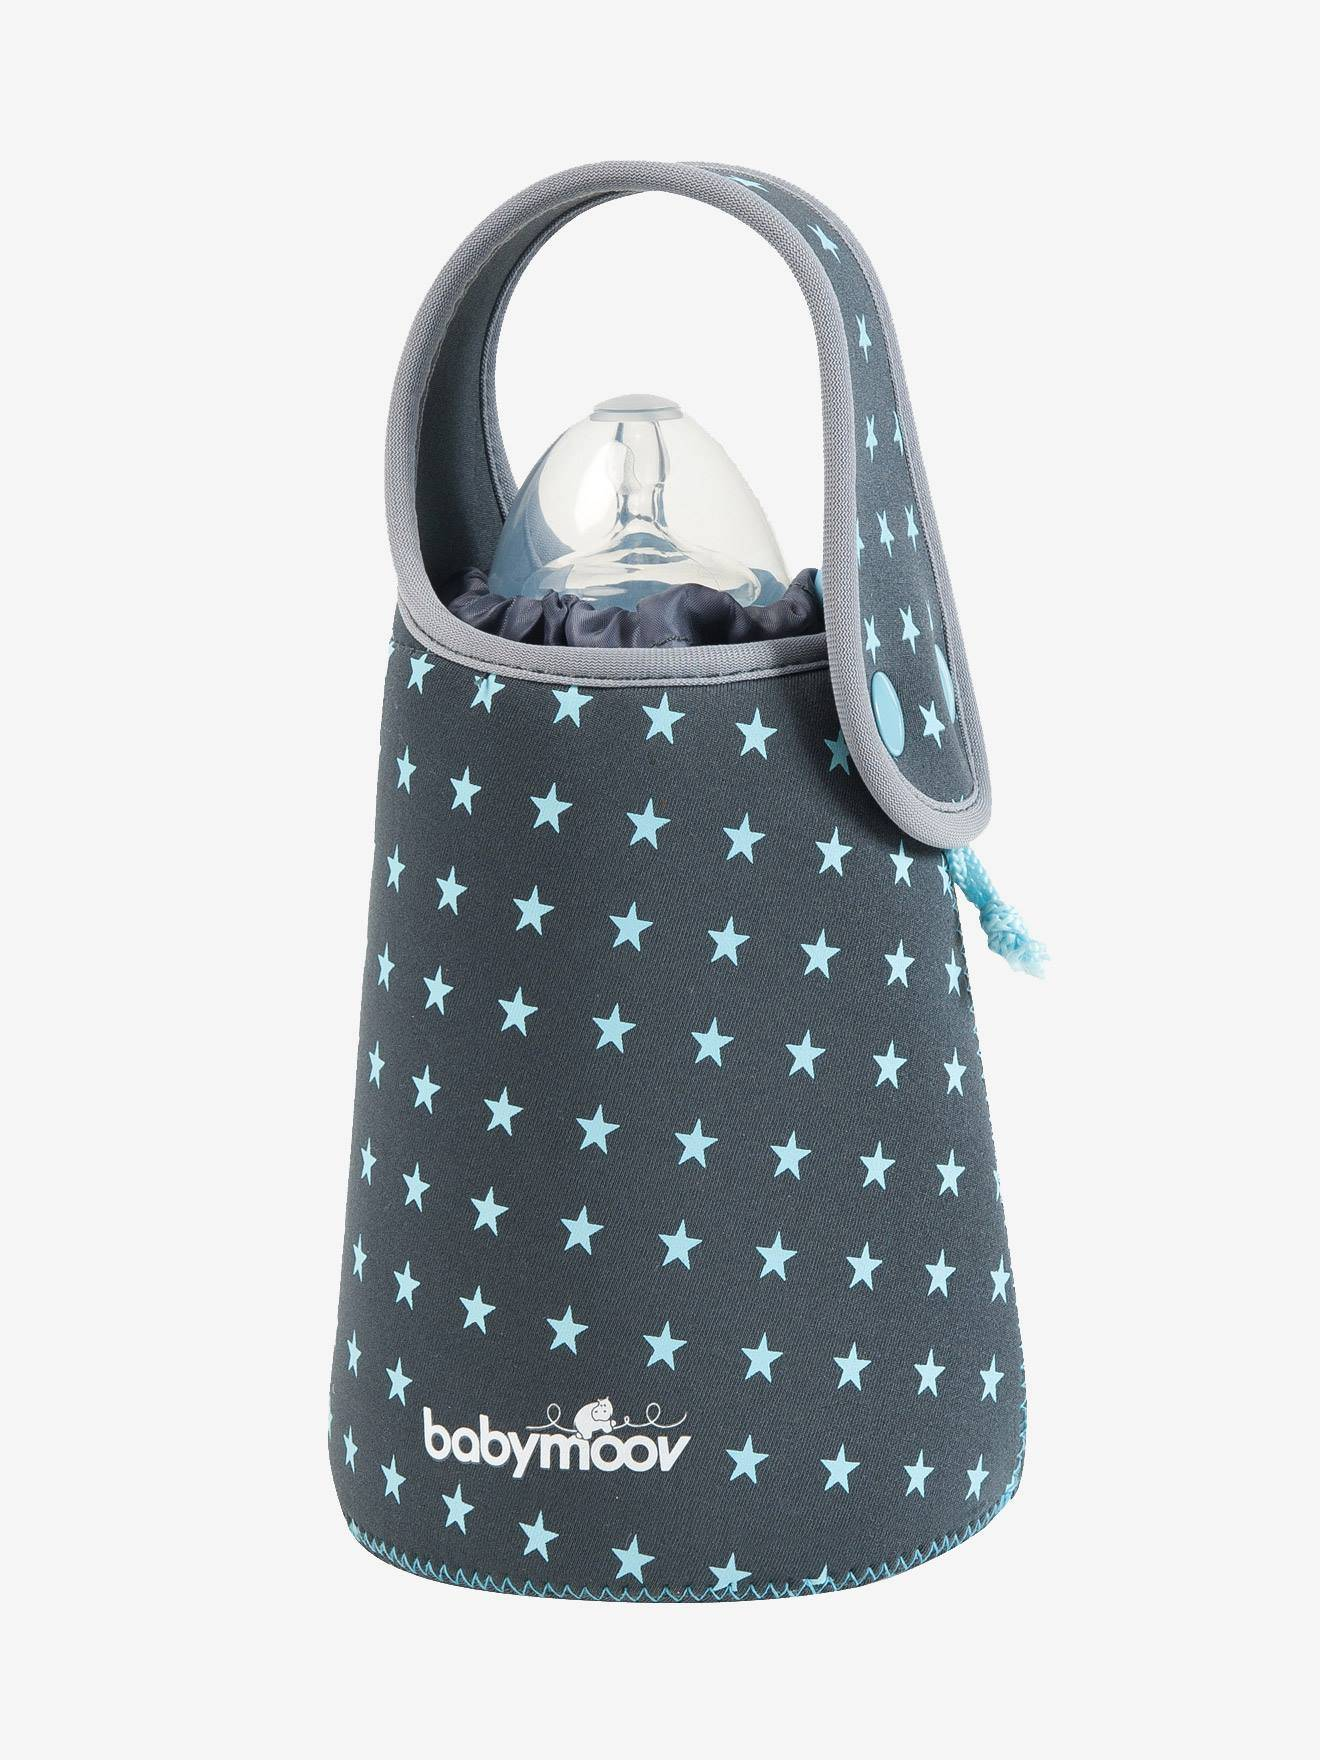 babymoov chauffe-biberon autonome babymoov star gris/étoiles